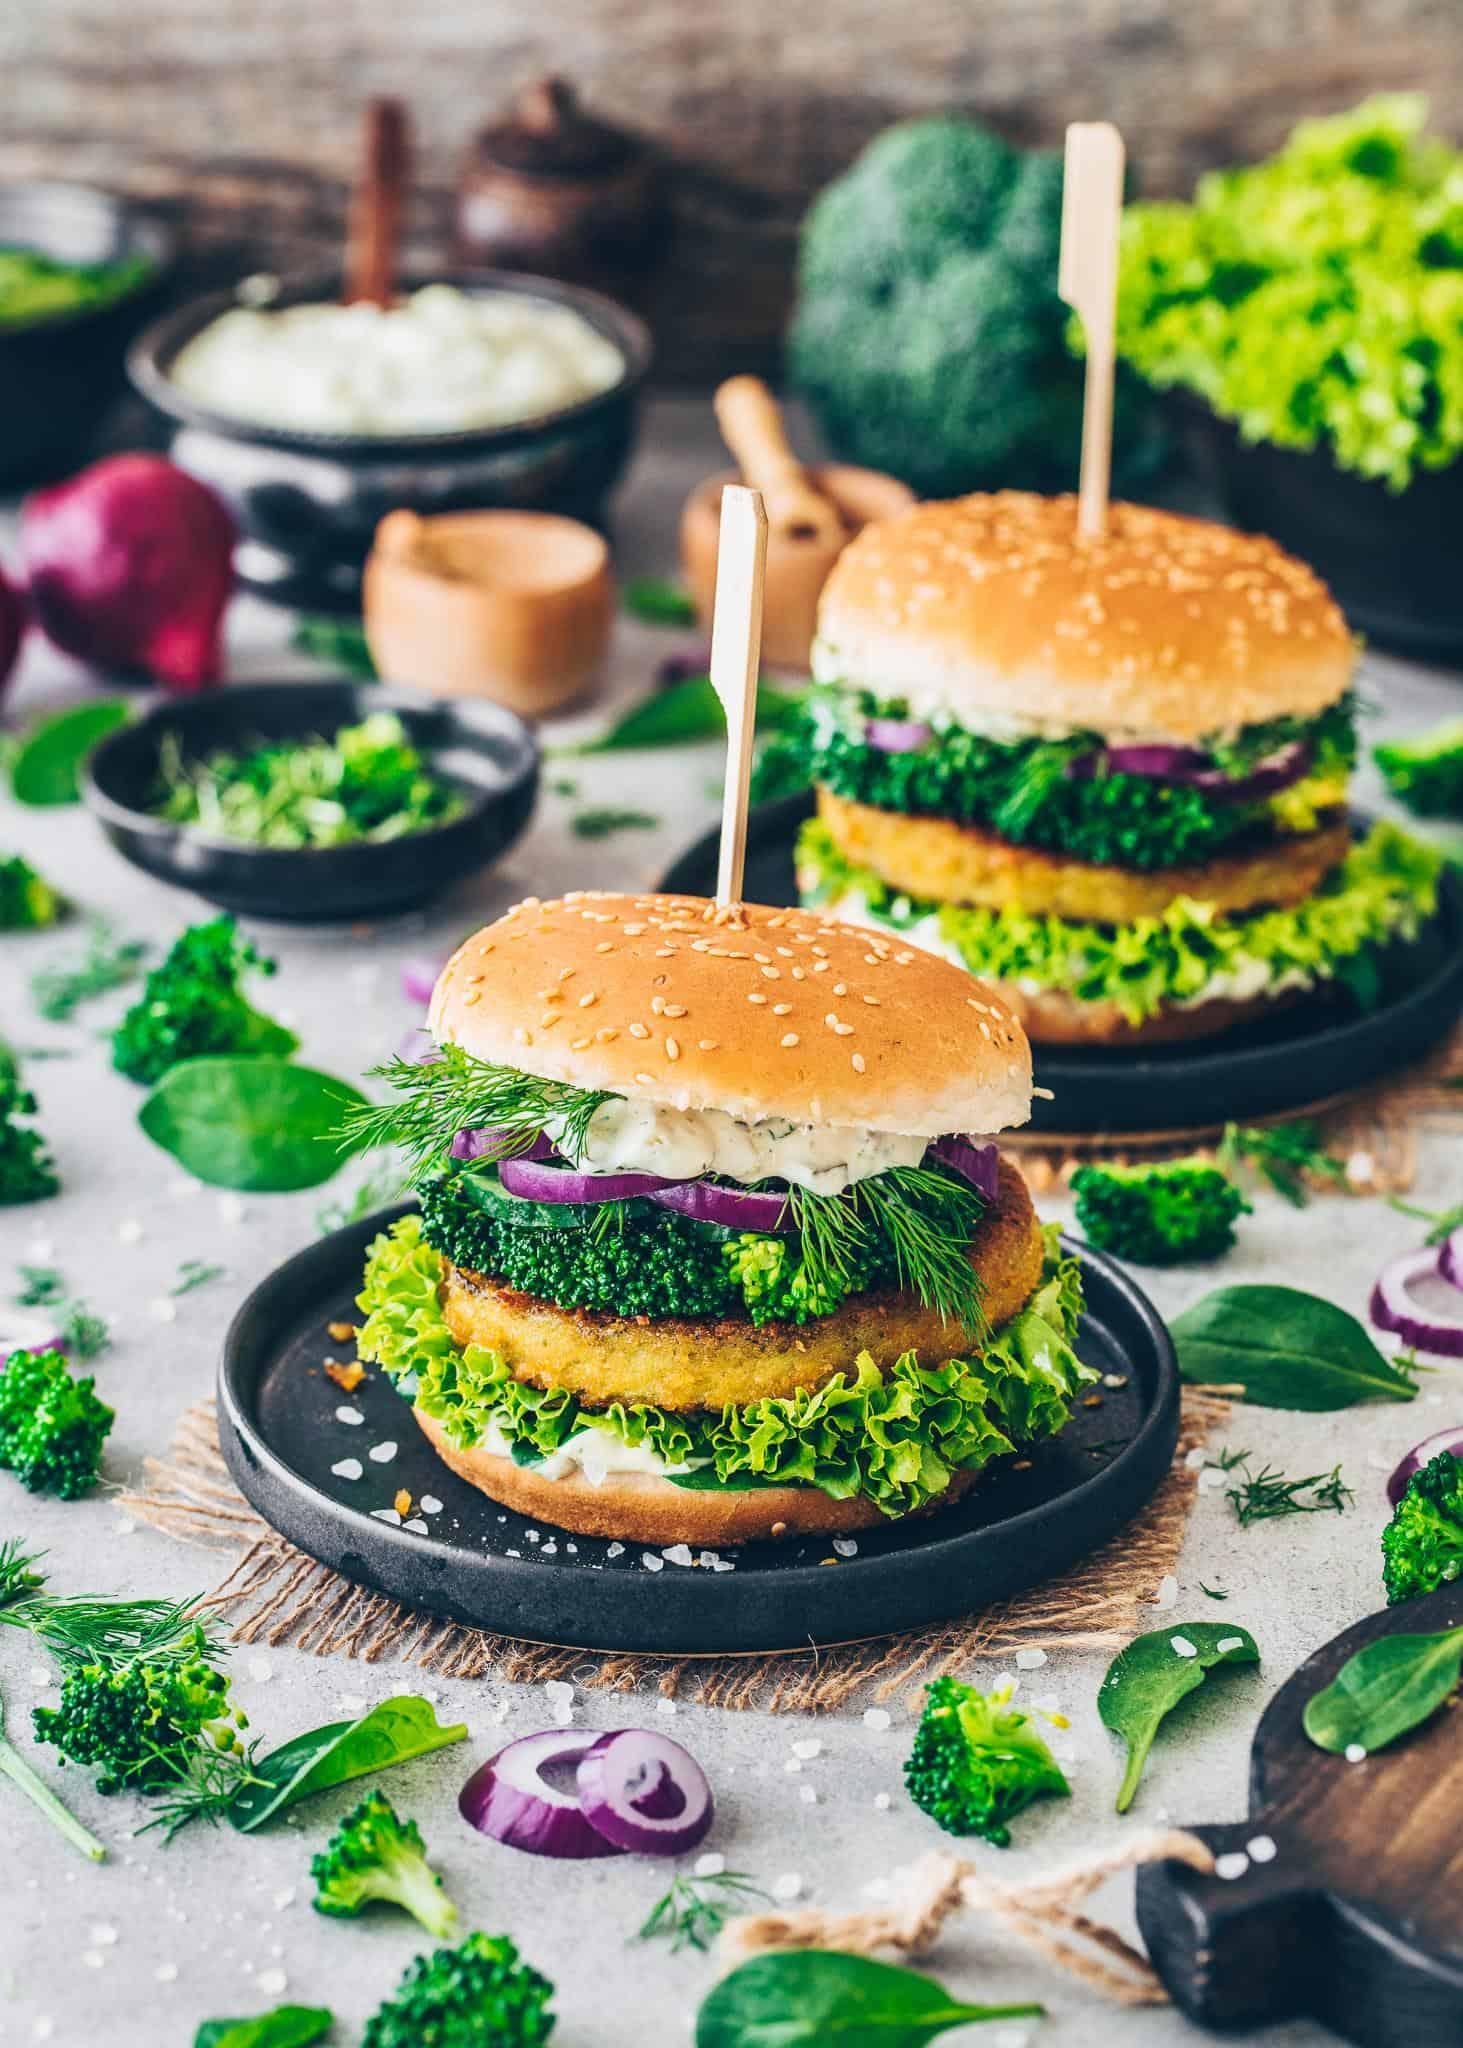 Broccoli Burger with Vegan Remoulade